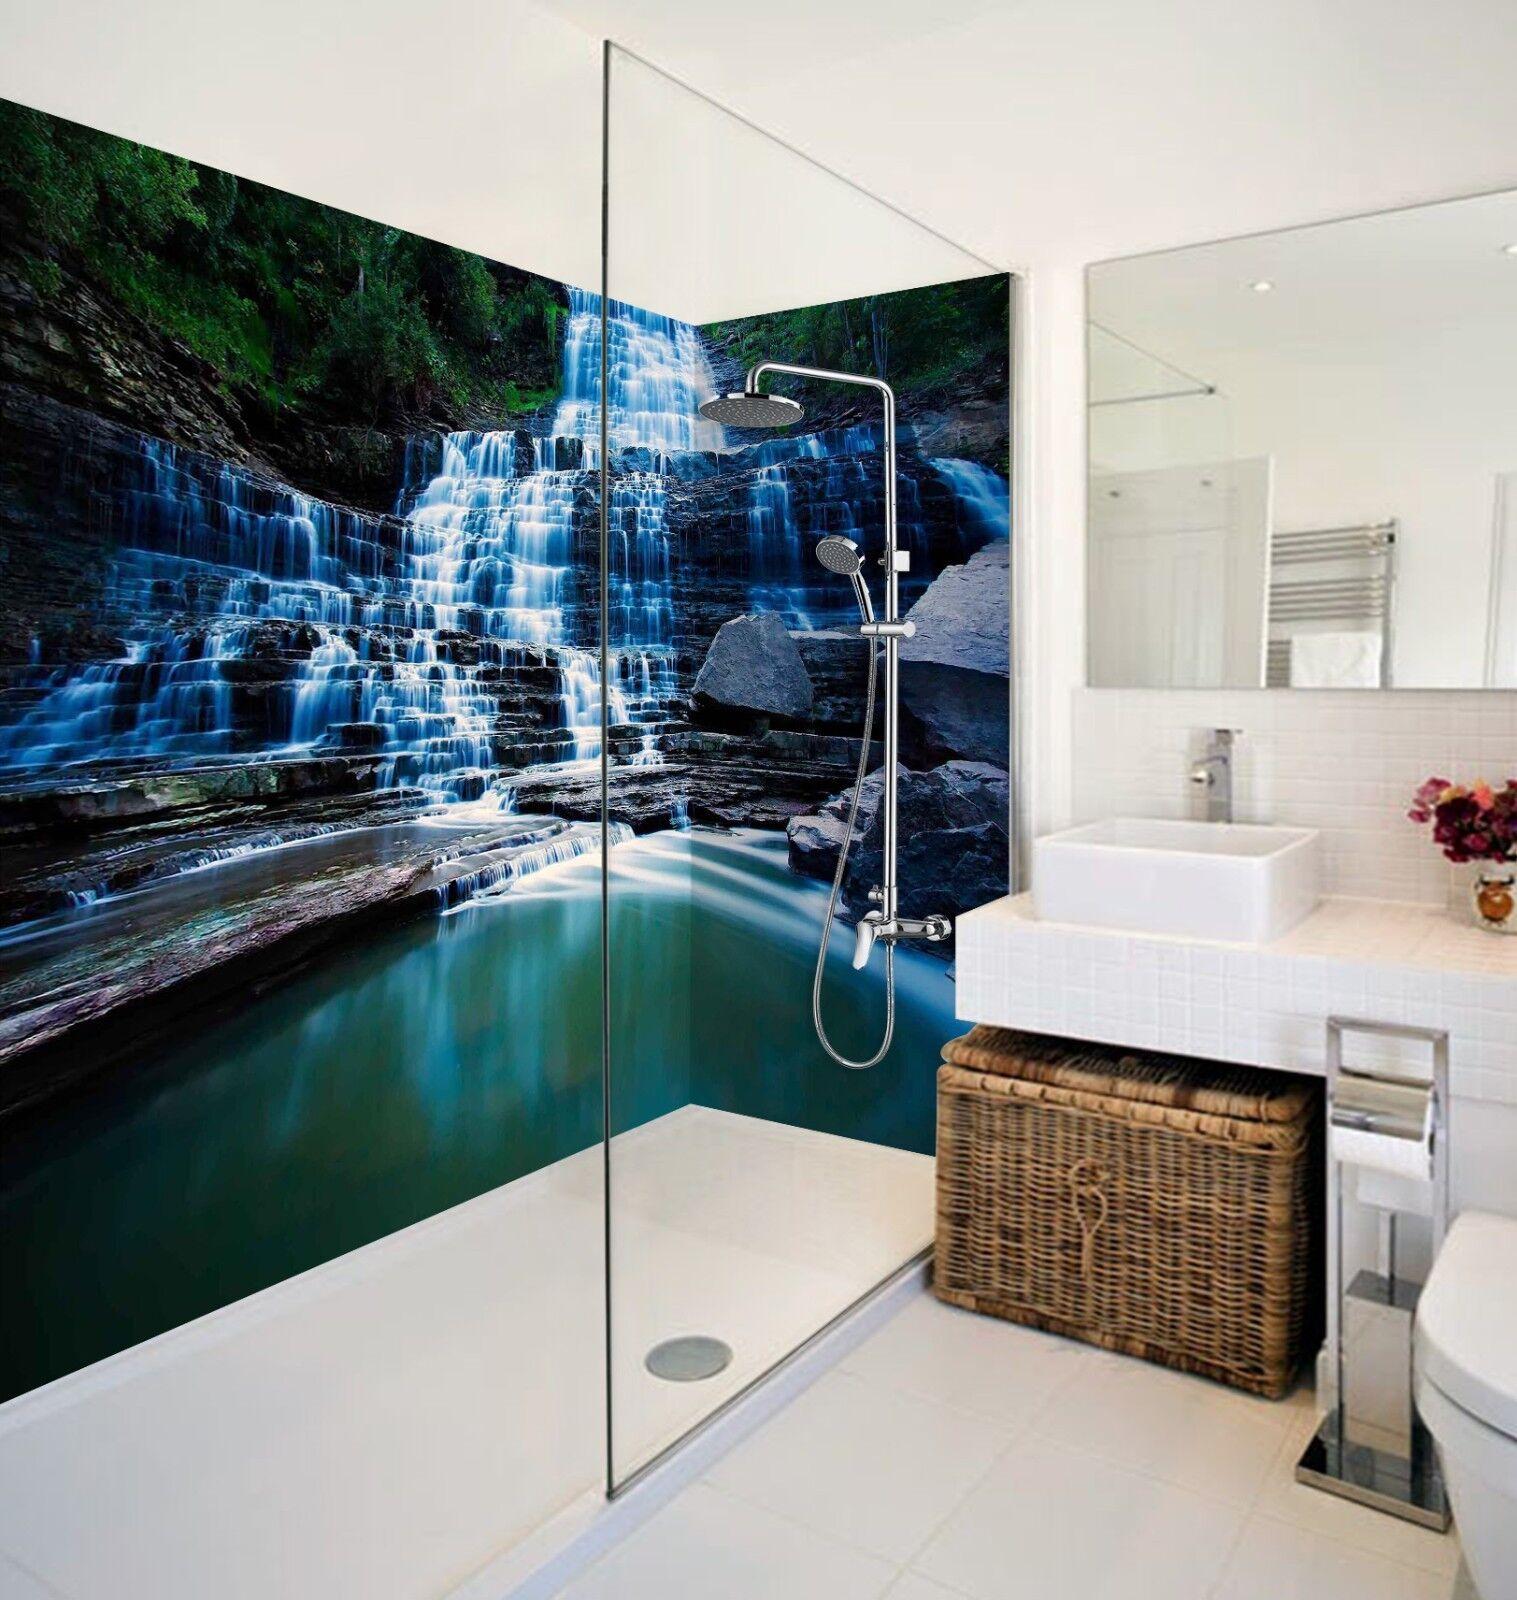 3D Waterfall Cliffs 547 WallPaper Bathroom Print Decal Wall Deco AJ WALLPAPER AU